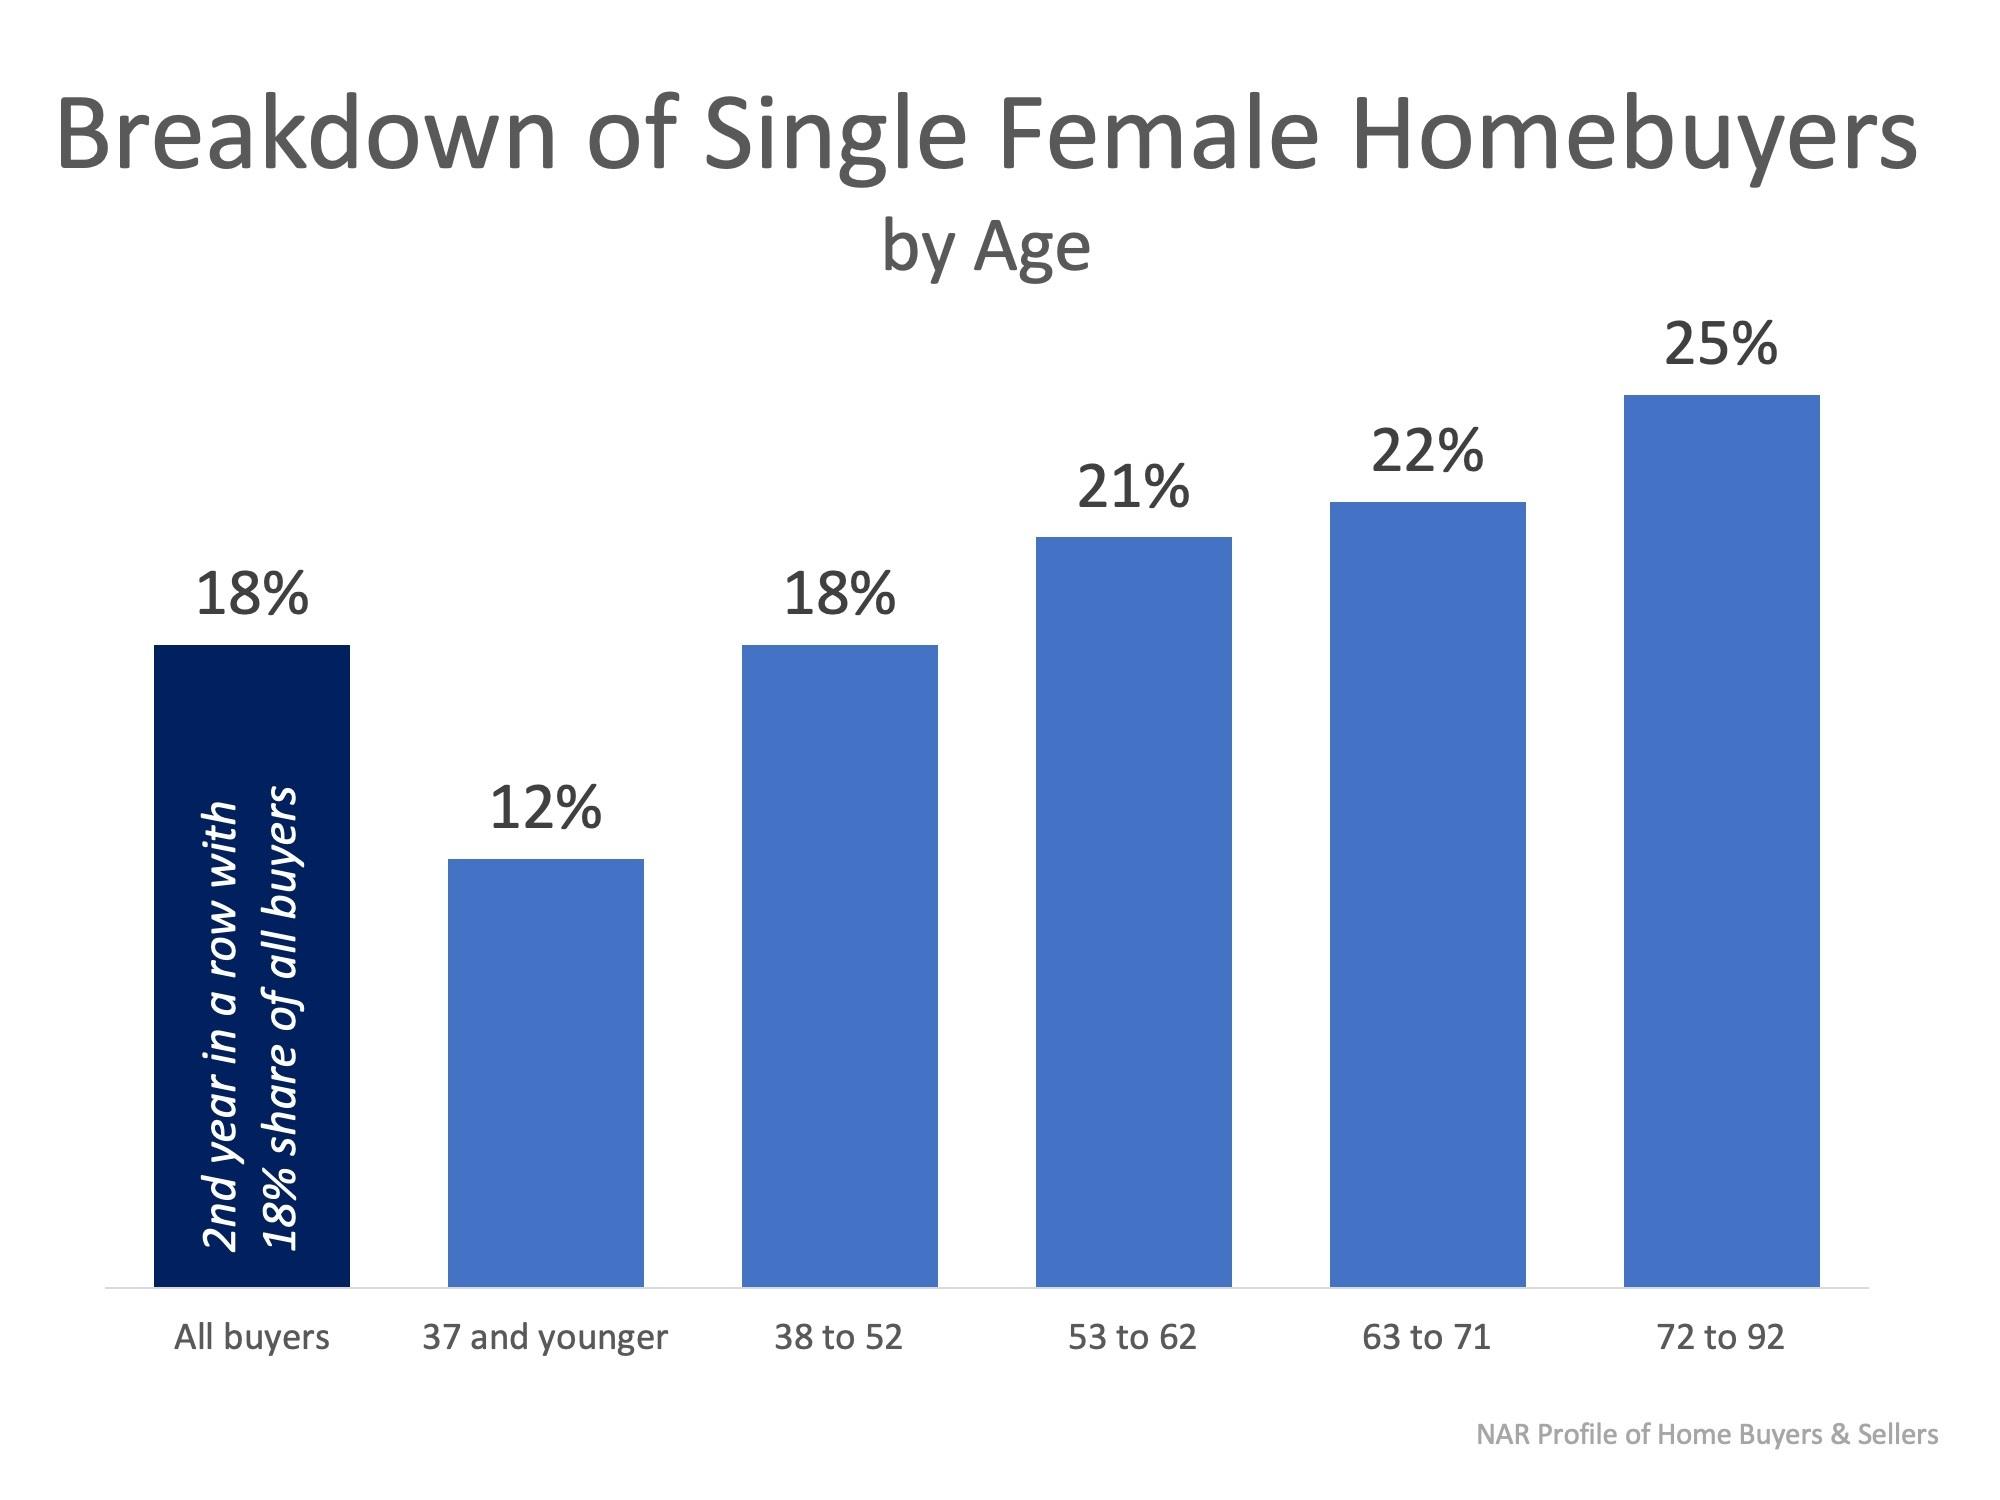 Breakdown of Single Female Homebuyers